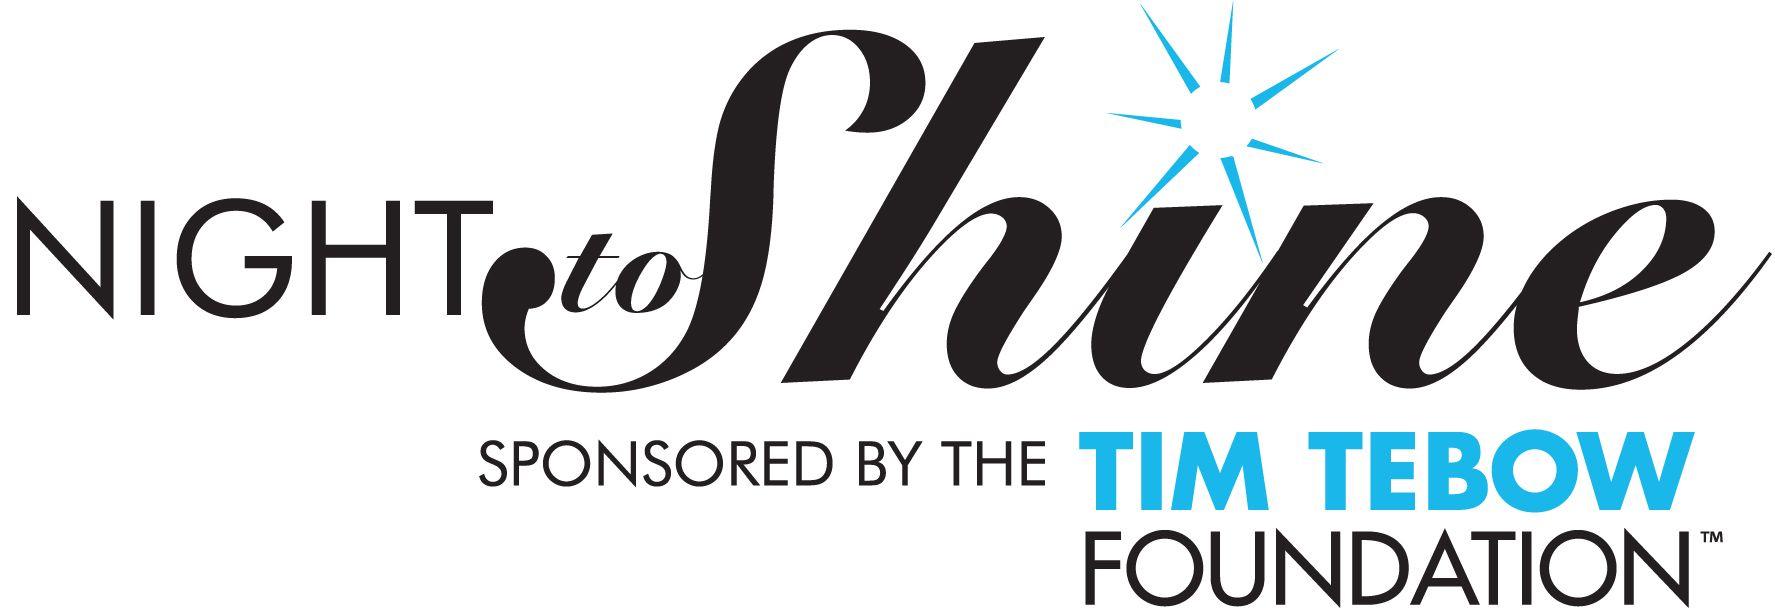 Tim Tebow Foundation Logo